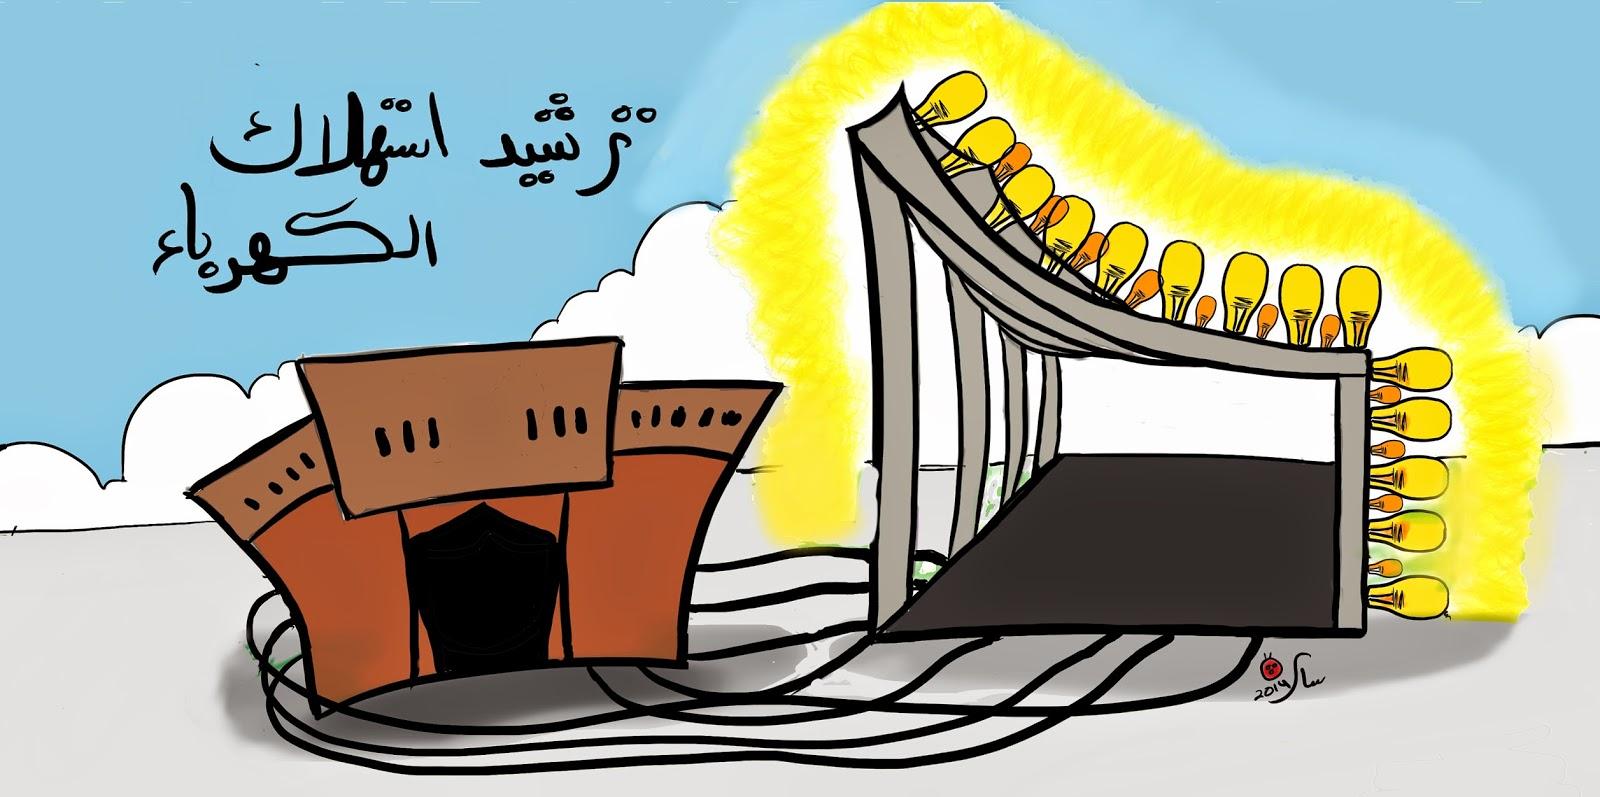 Sarah S Cartoons ترشيد استهلاك الكهرباء